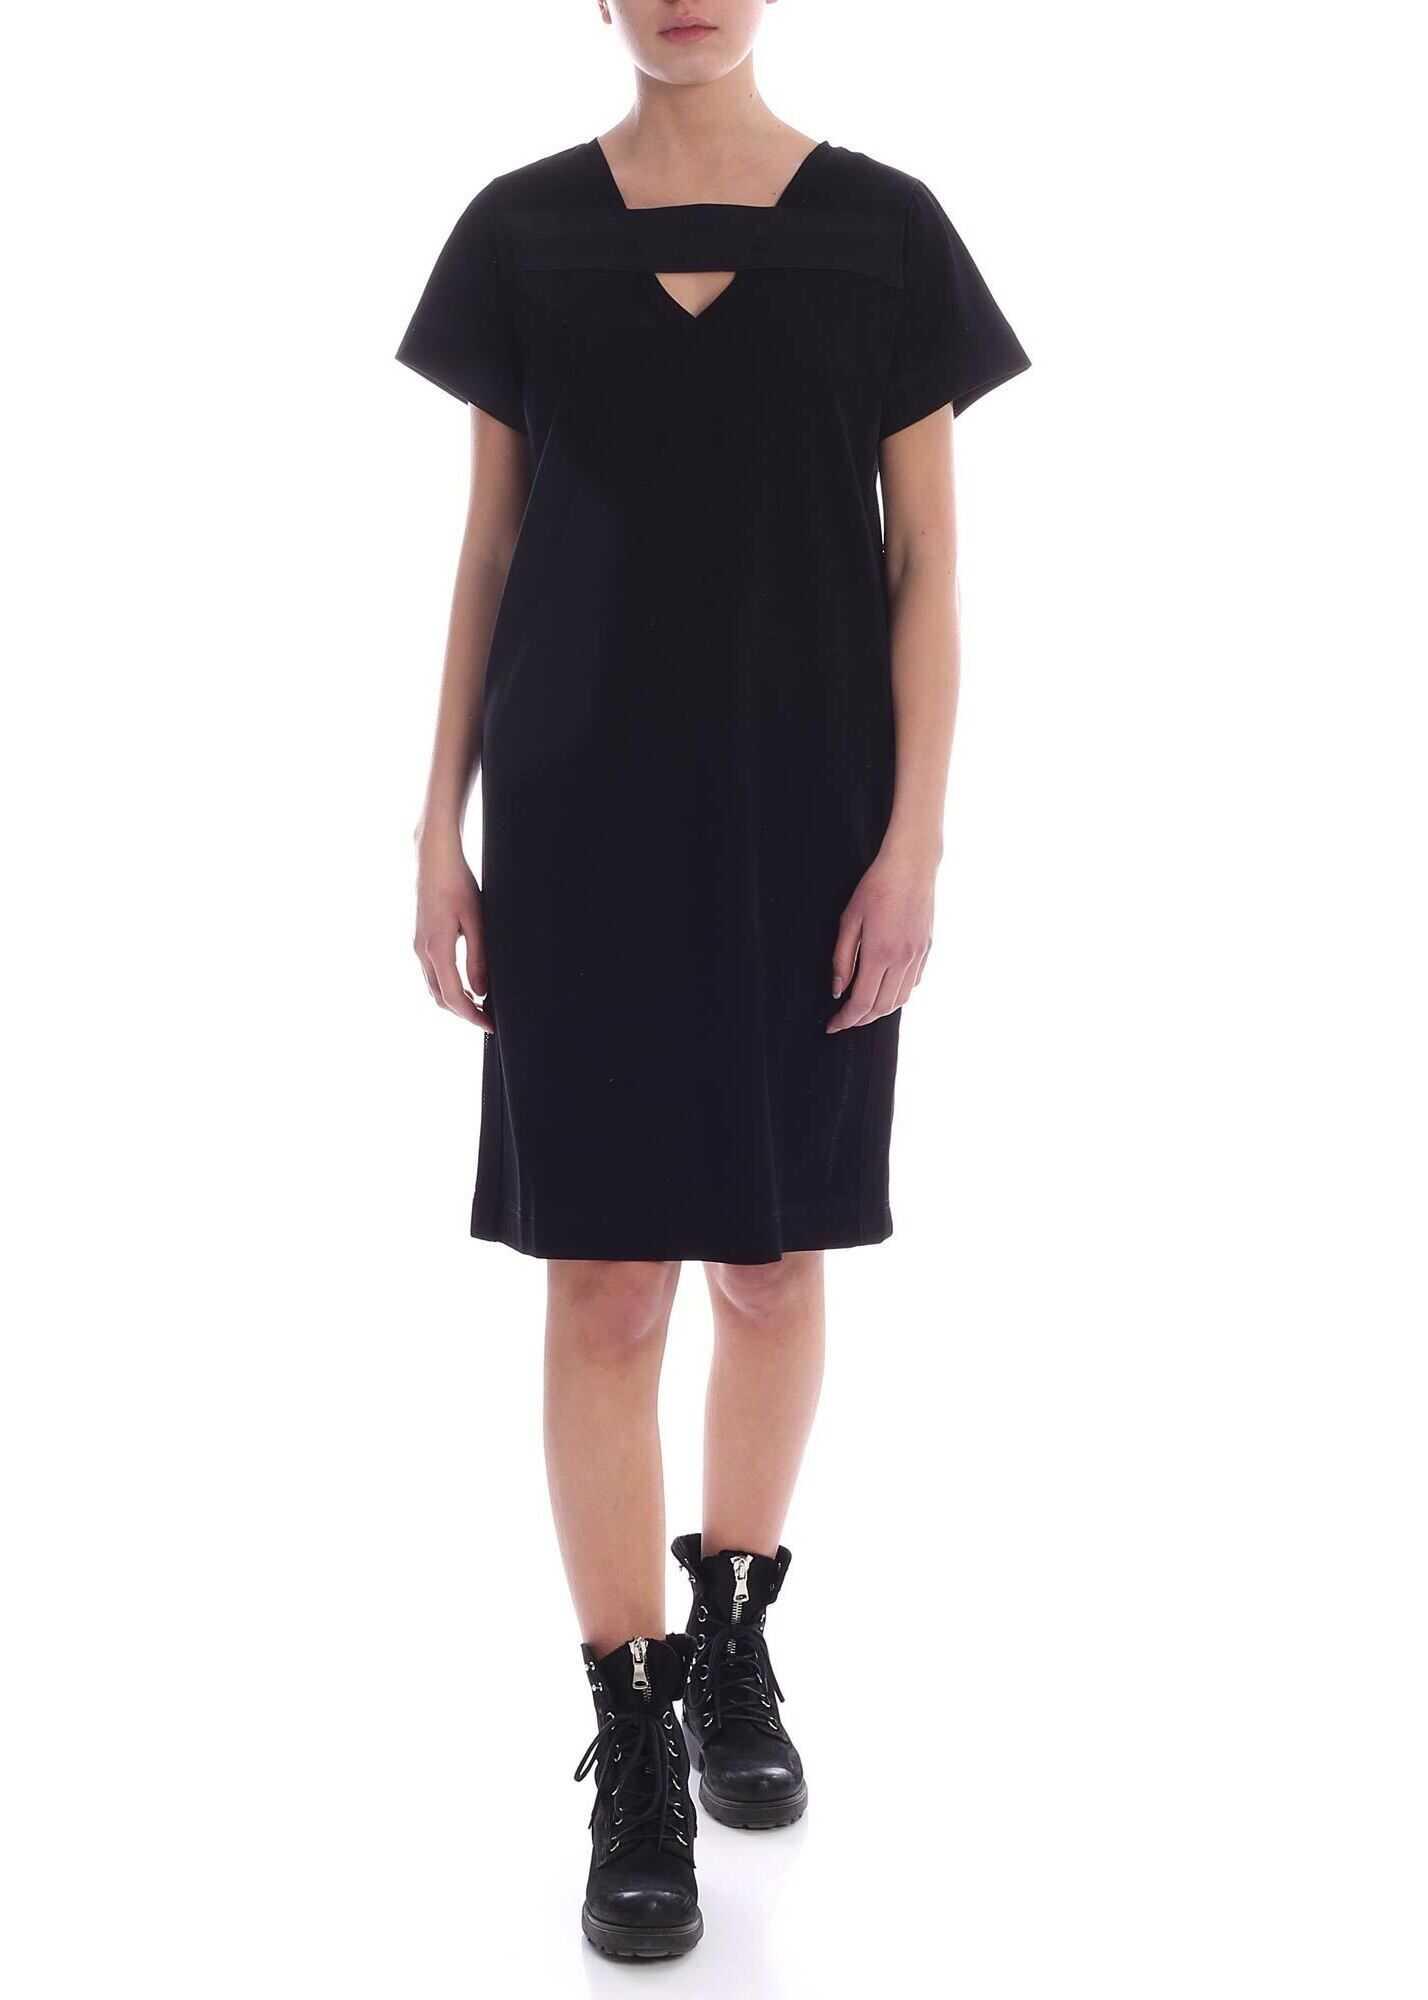 Diesel Stripe Dress In Black Black